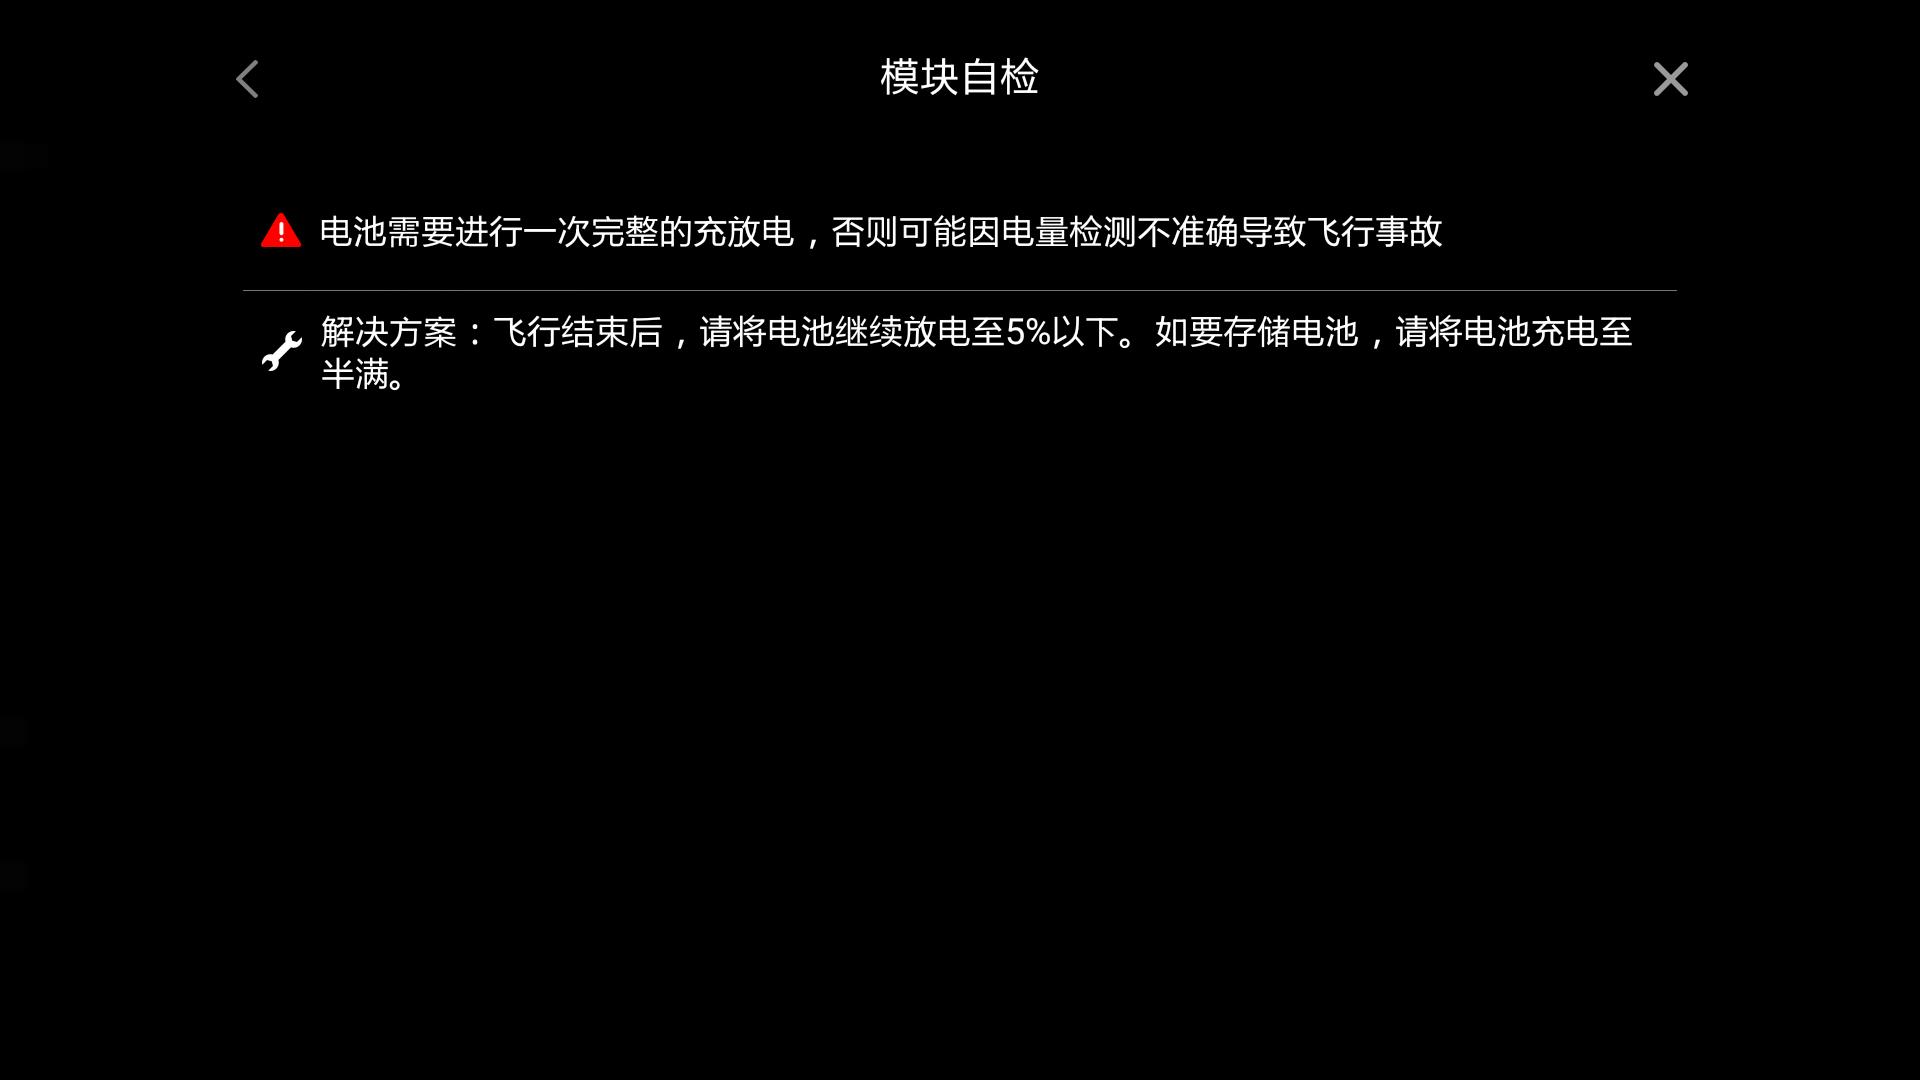 Screenshot_2015-09-04-18-30-38.png